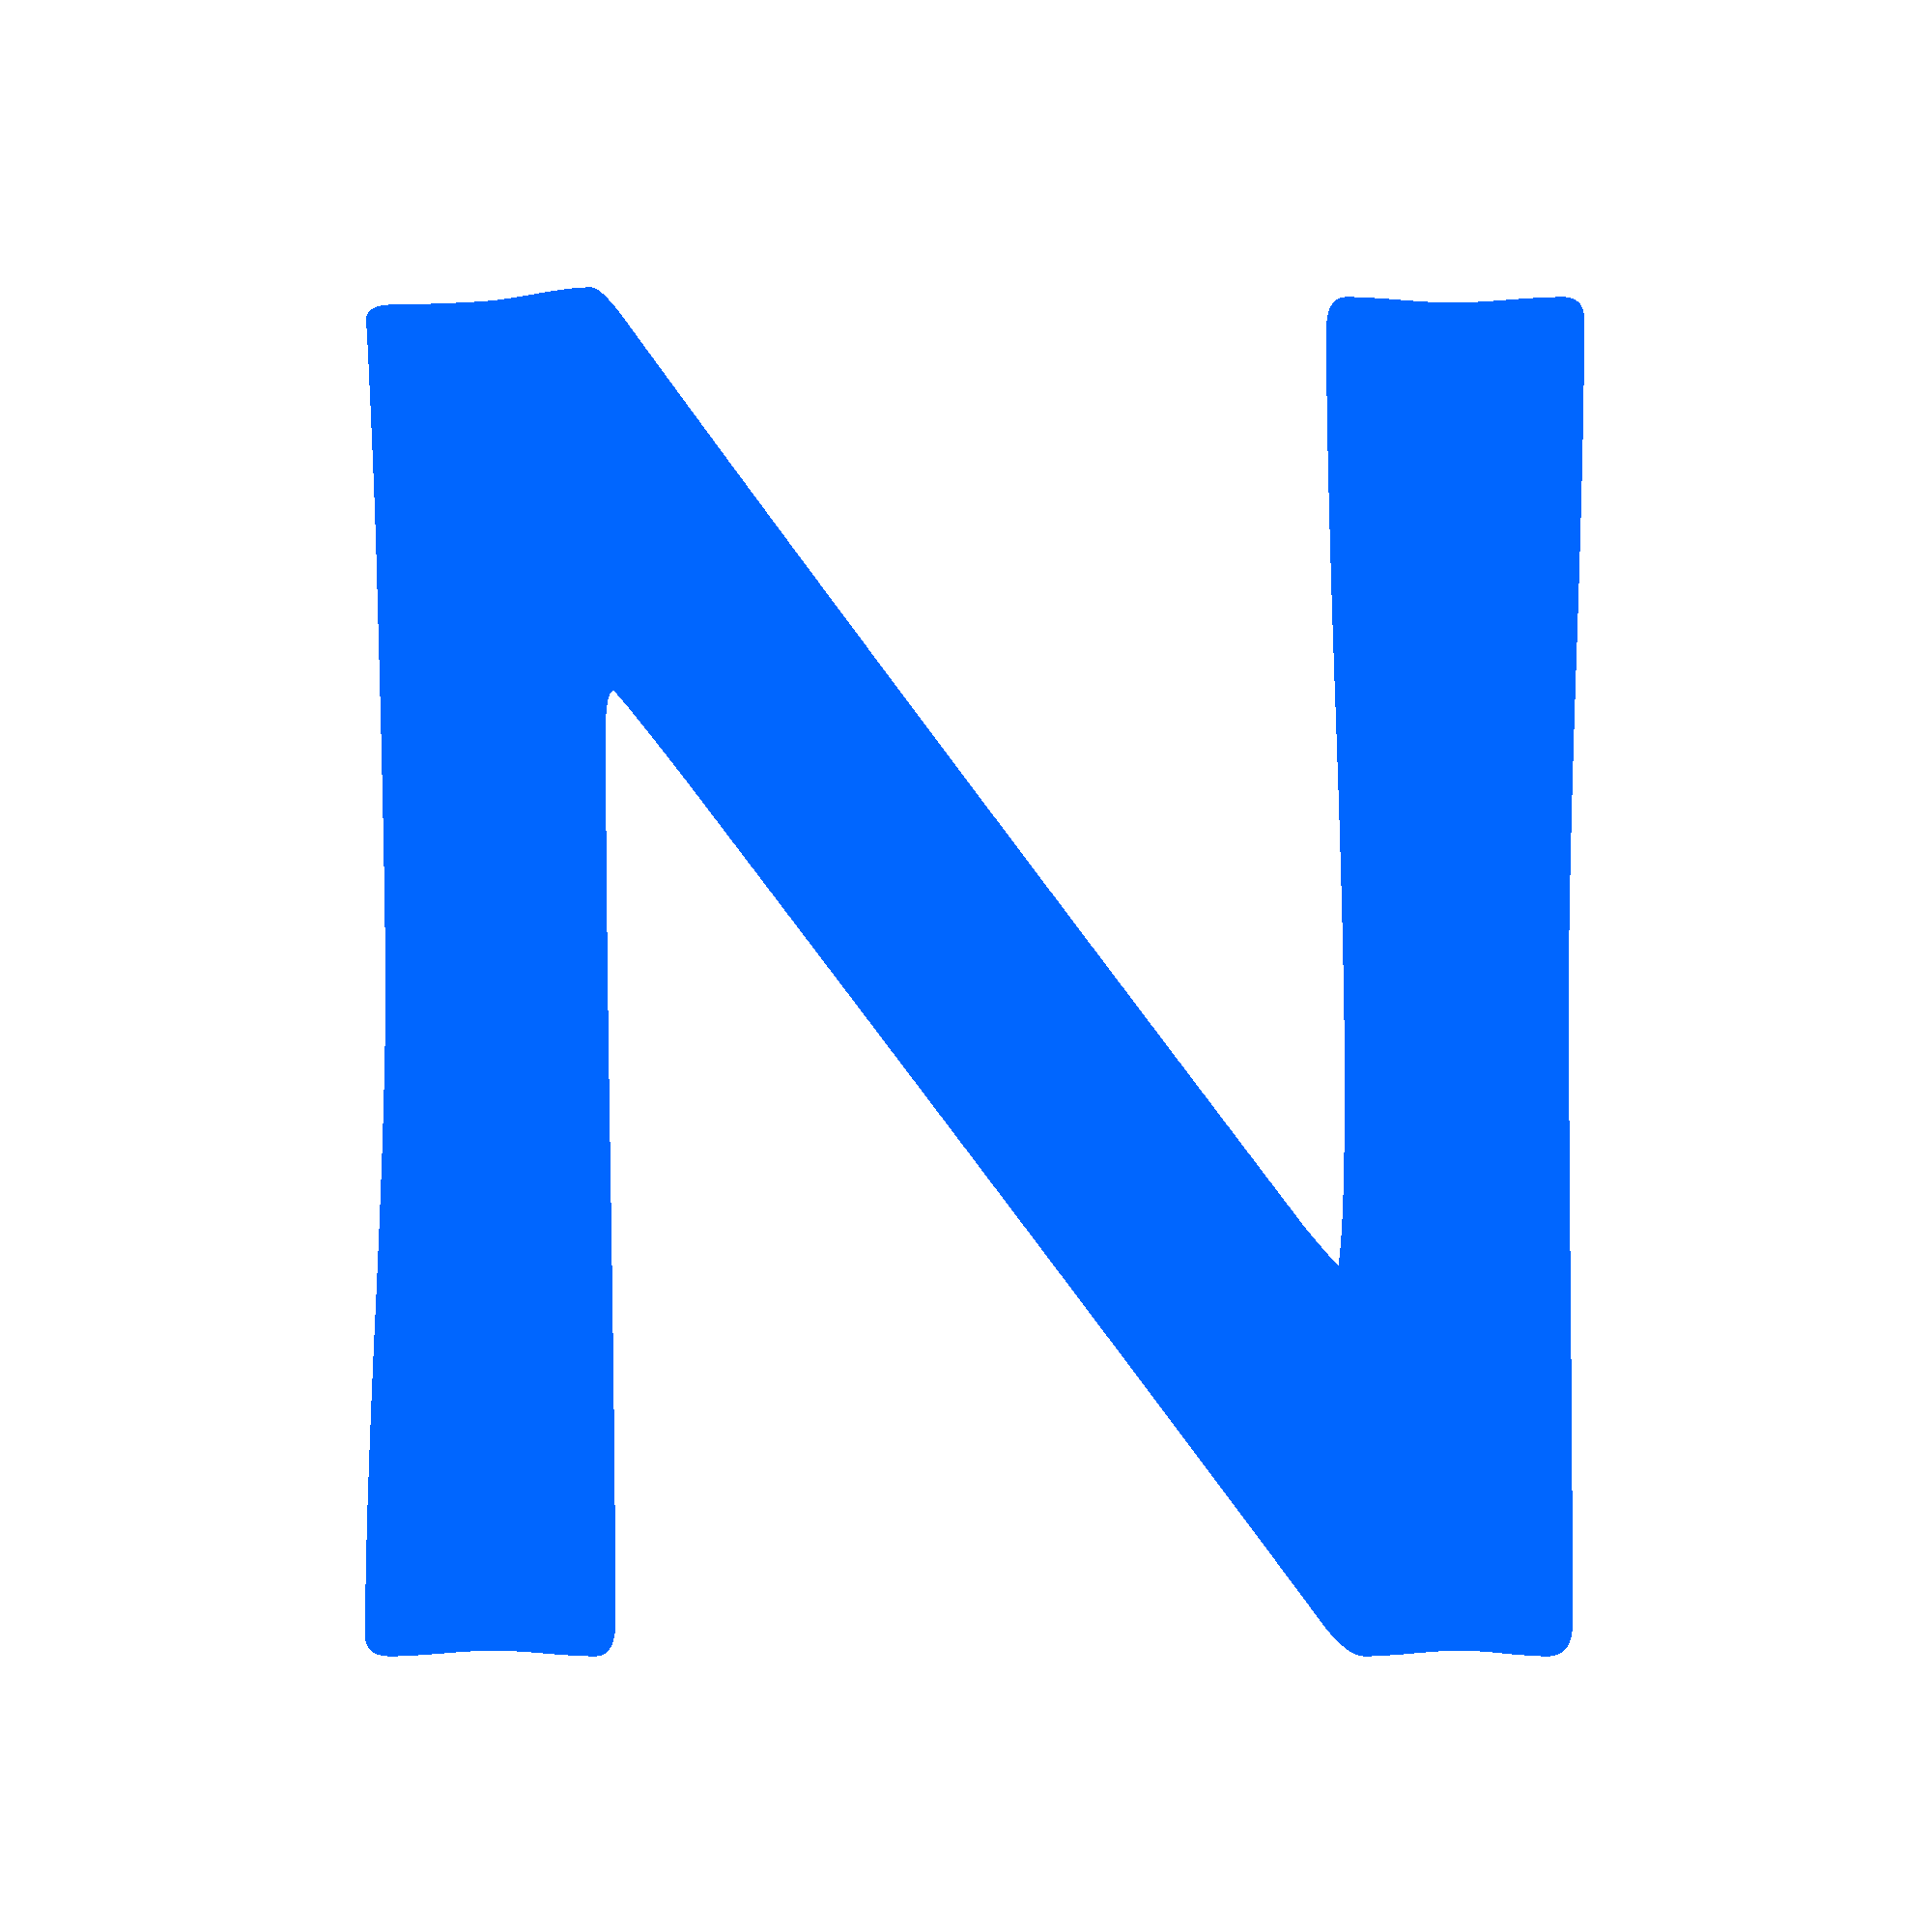 Alphabet Letters Free Vector Art  4184 Free Downloads